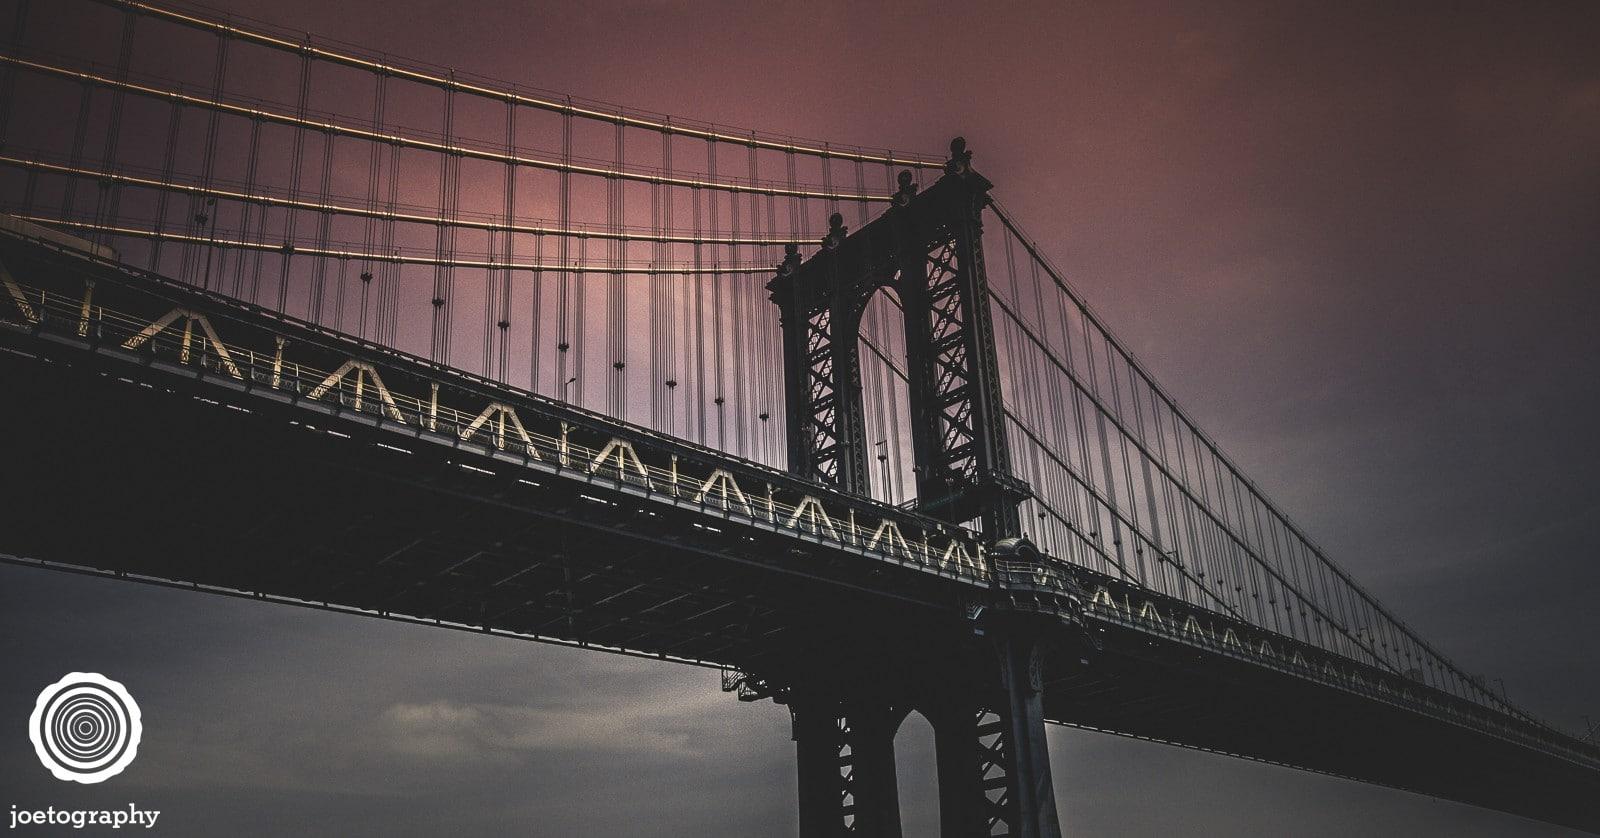 joetography-travel-photography-new-york-city-2015-7